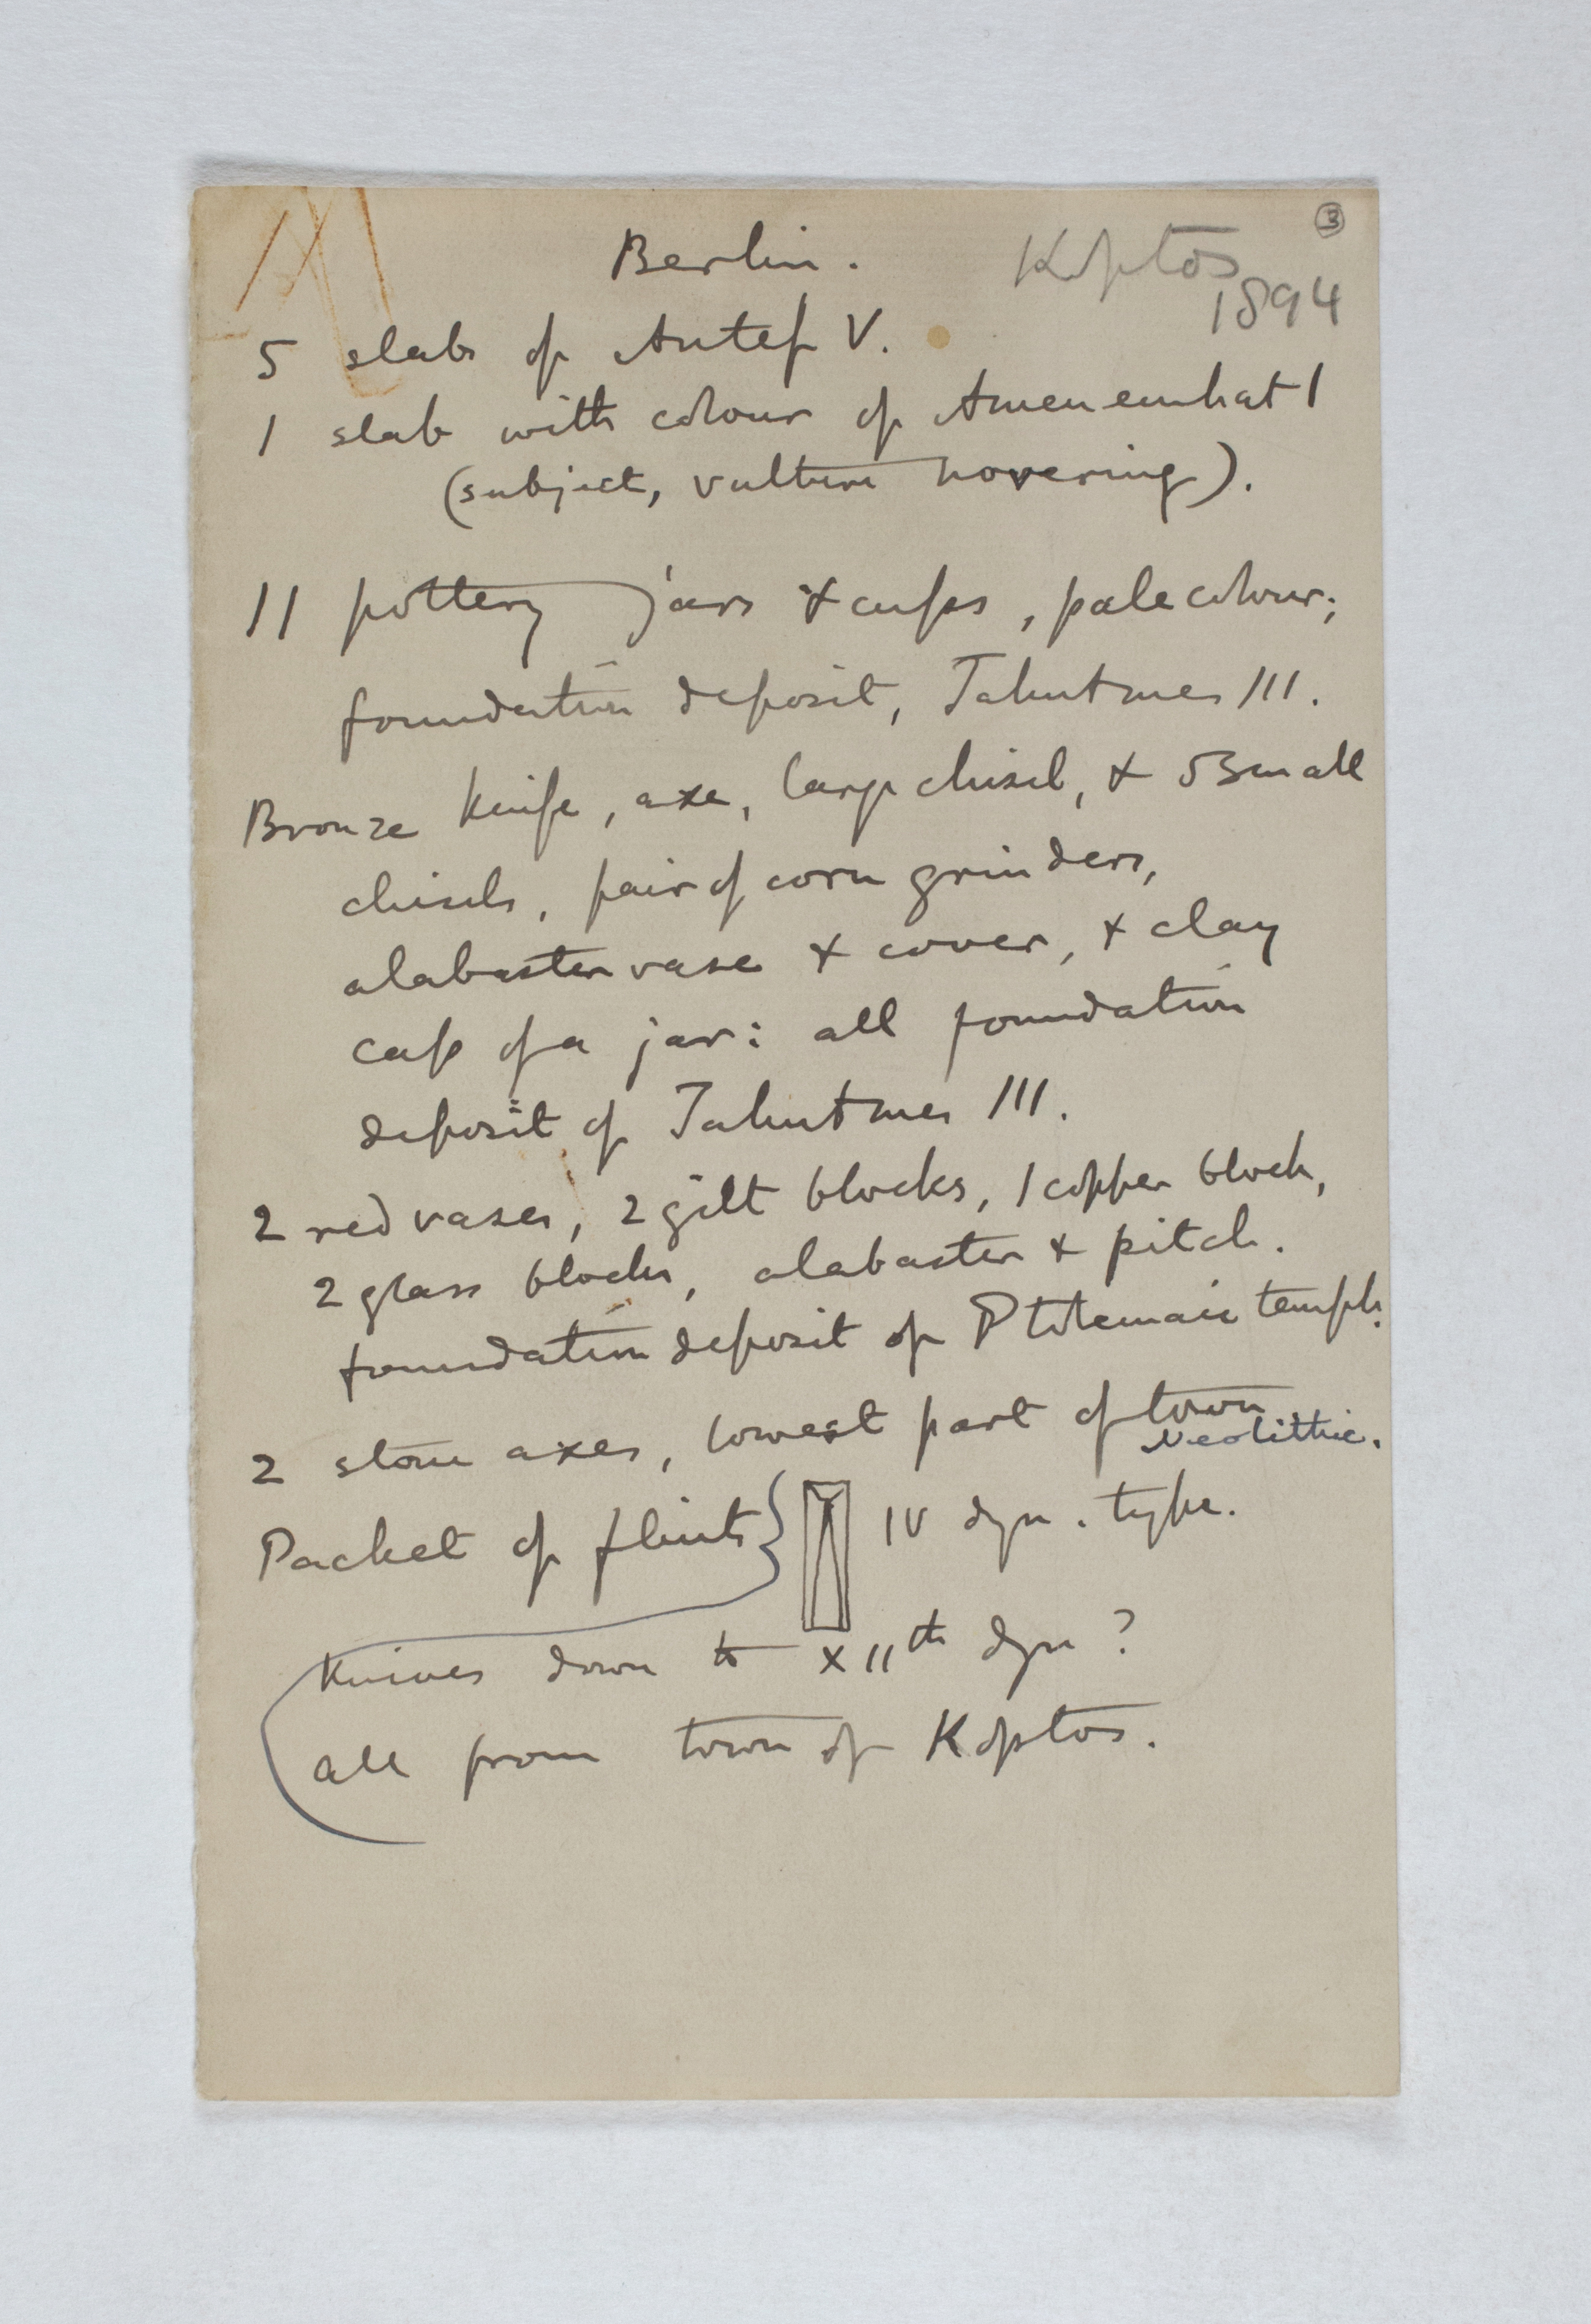 Koptos 1983-1894, Individual Institution List, PMA/WFP1/D/2/3